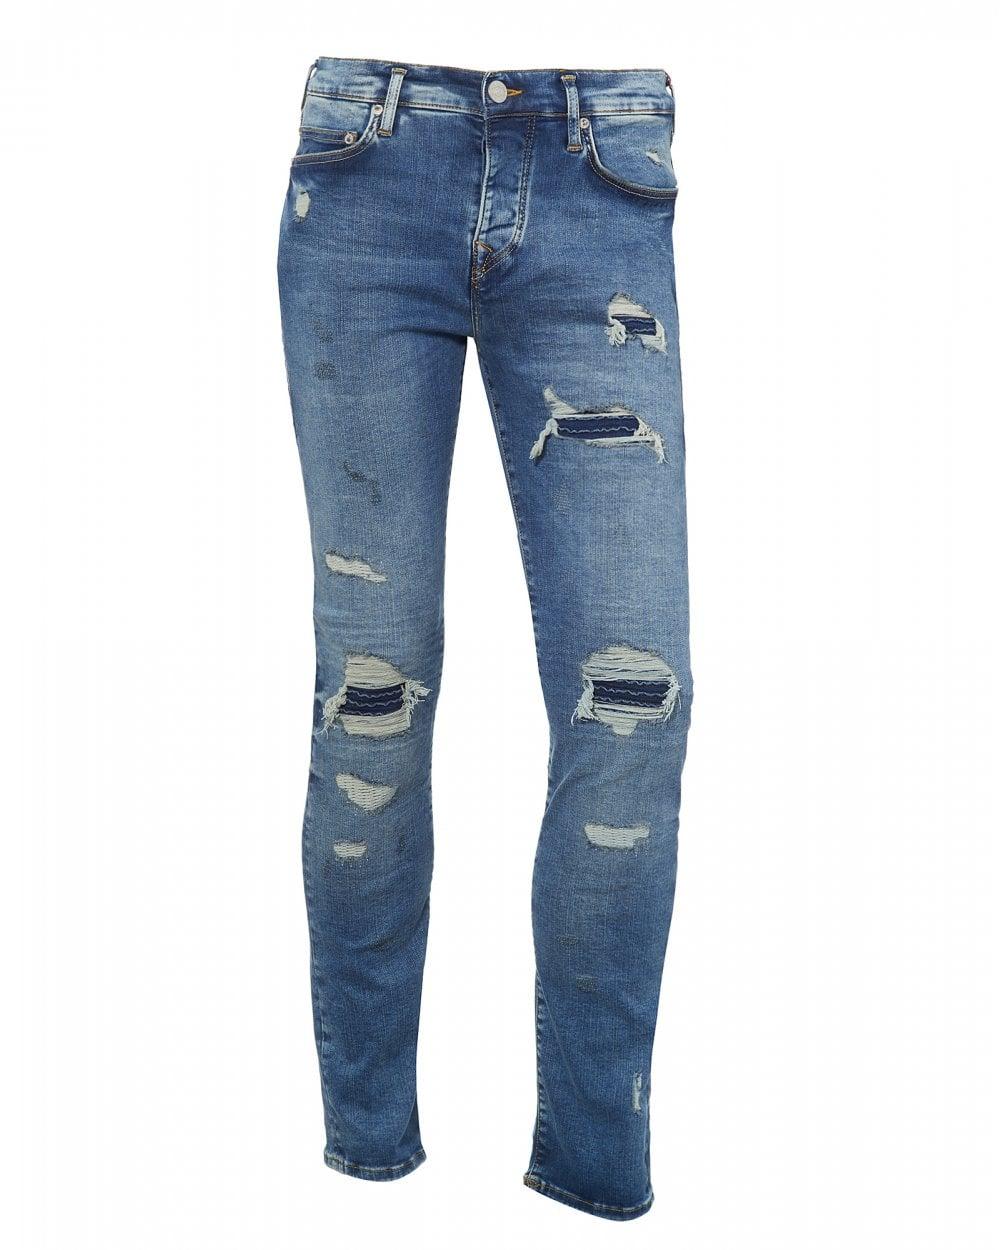 b45374ea7 True Religion Mens Rocco Destroyed Jeans, Navy Blue Denim